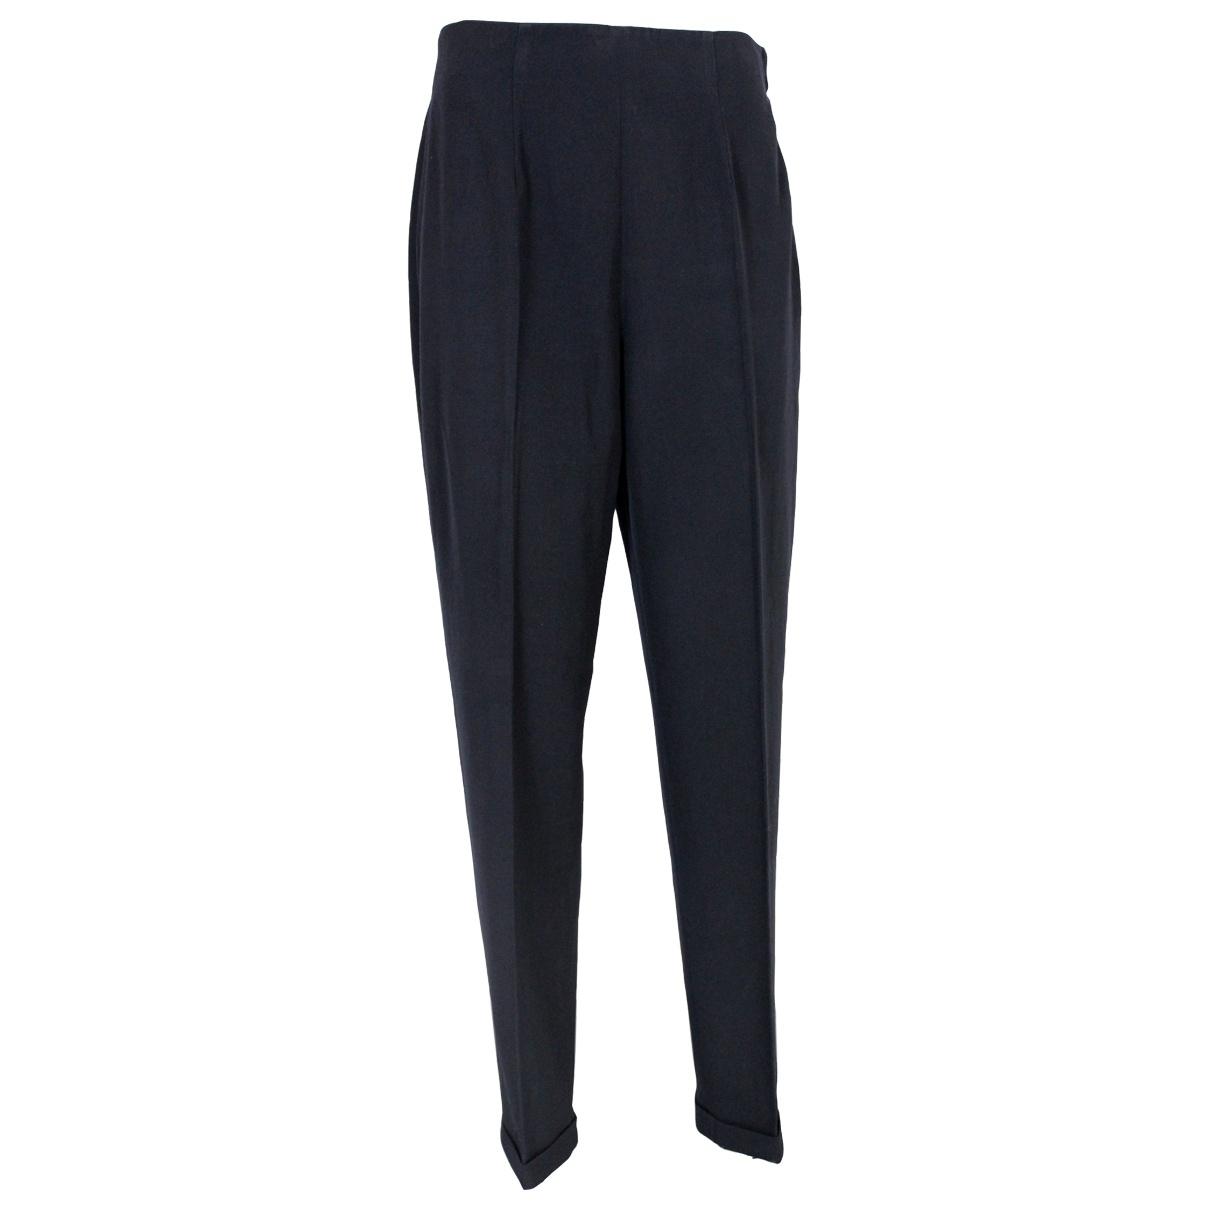 Katharine Hamnett \N Black Wool Trousers for Women 50-52 IT